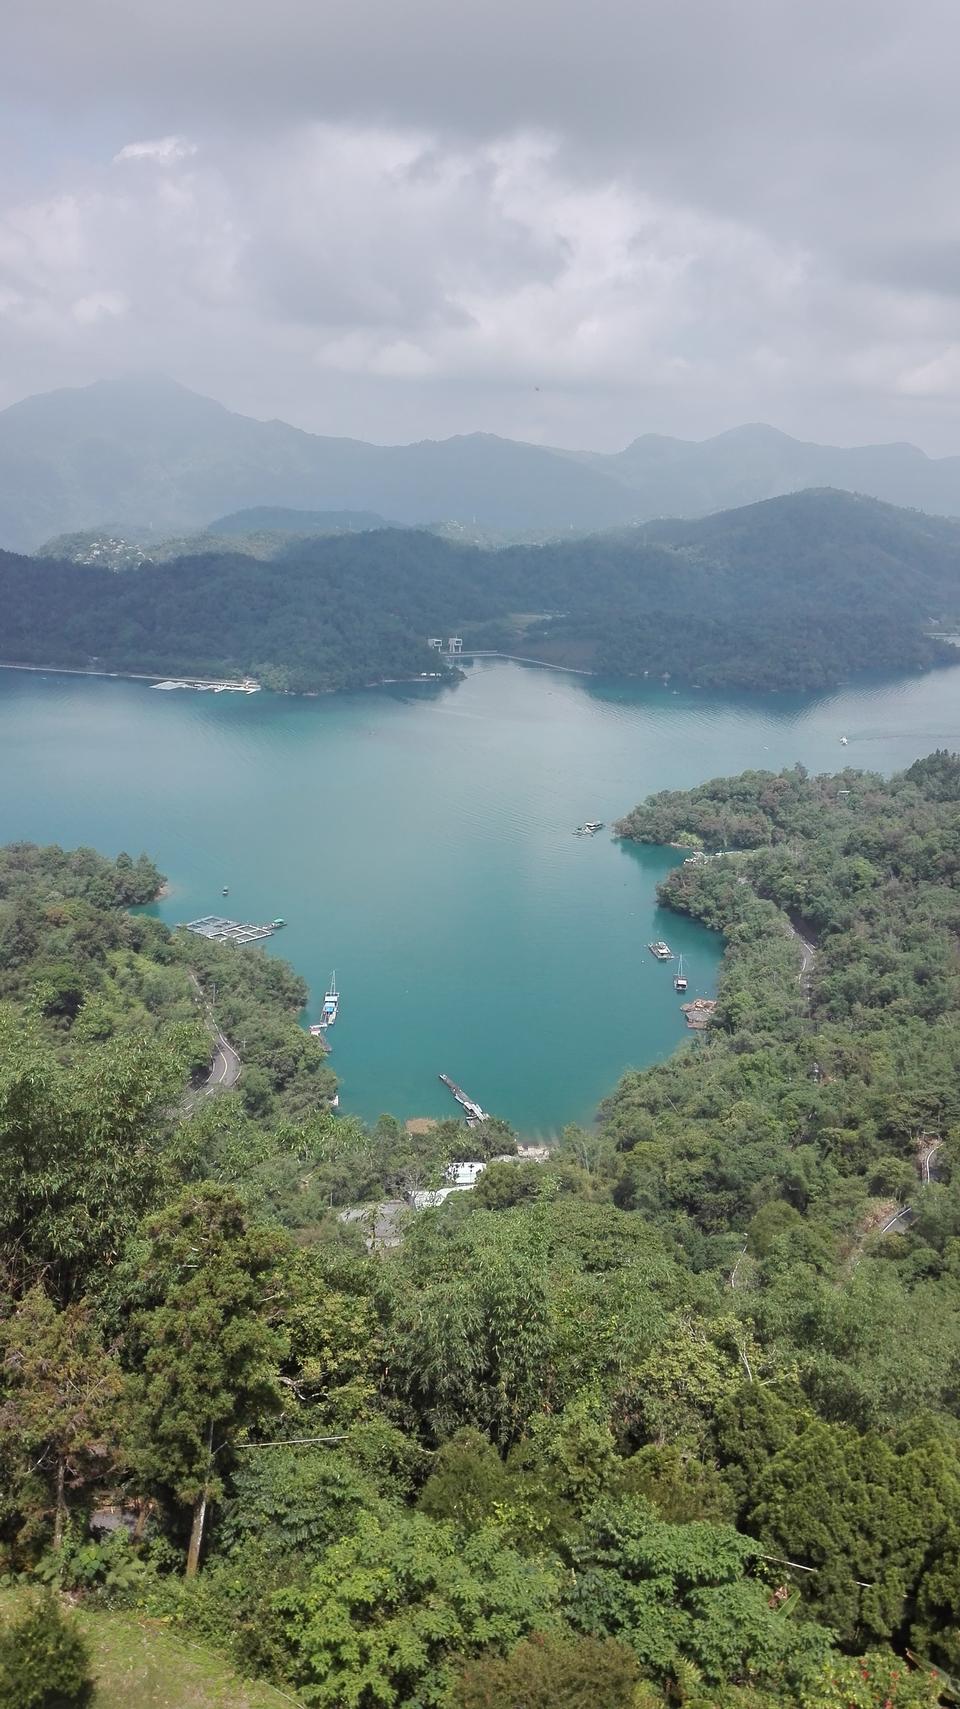 Taiwan, Son-Moon Lake